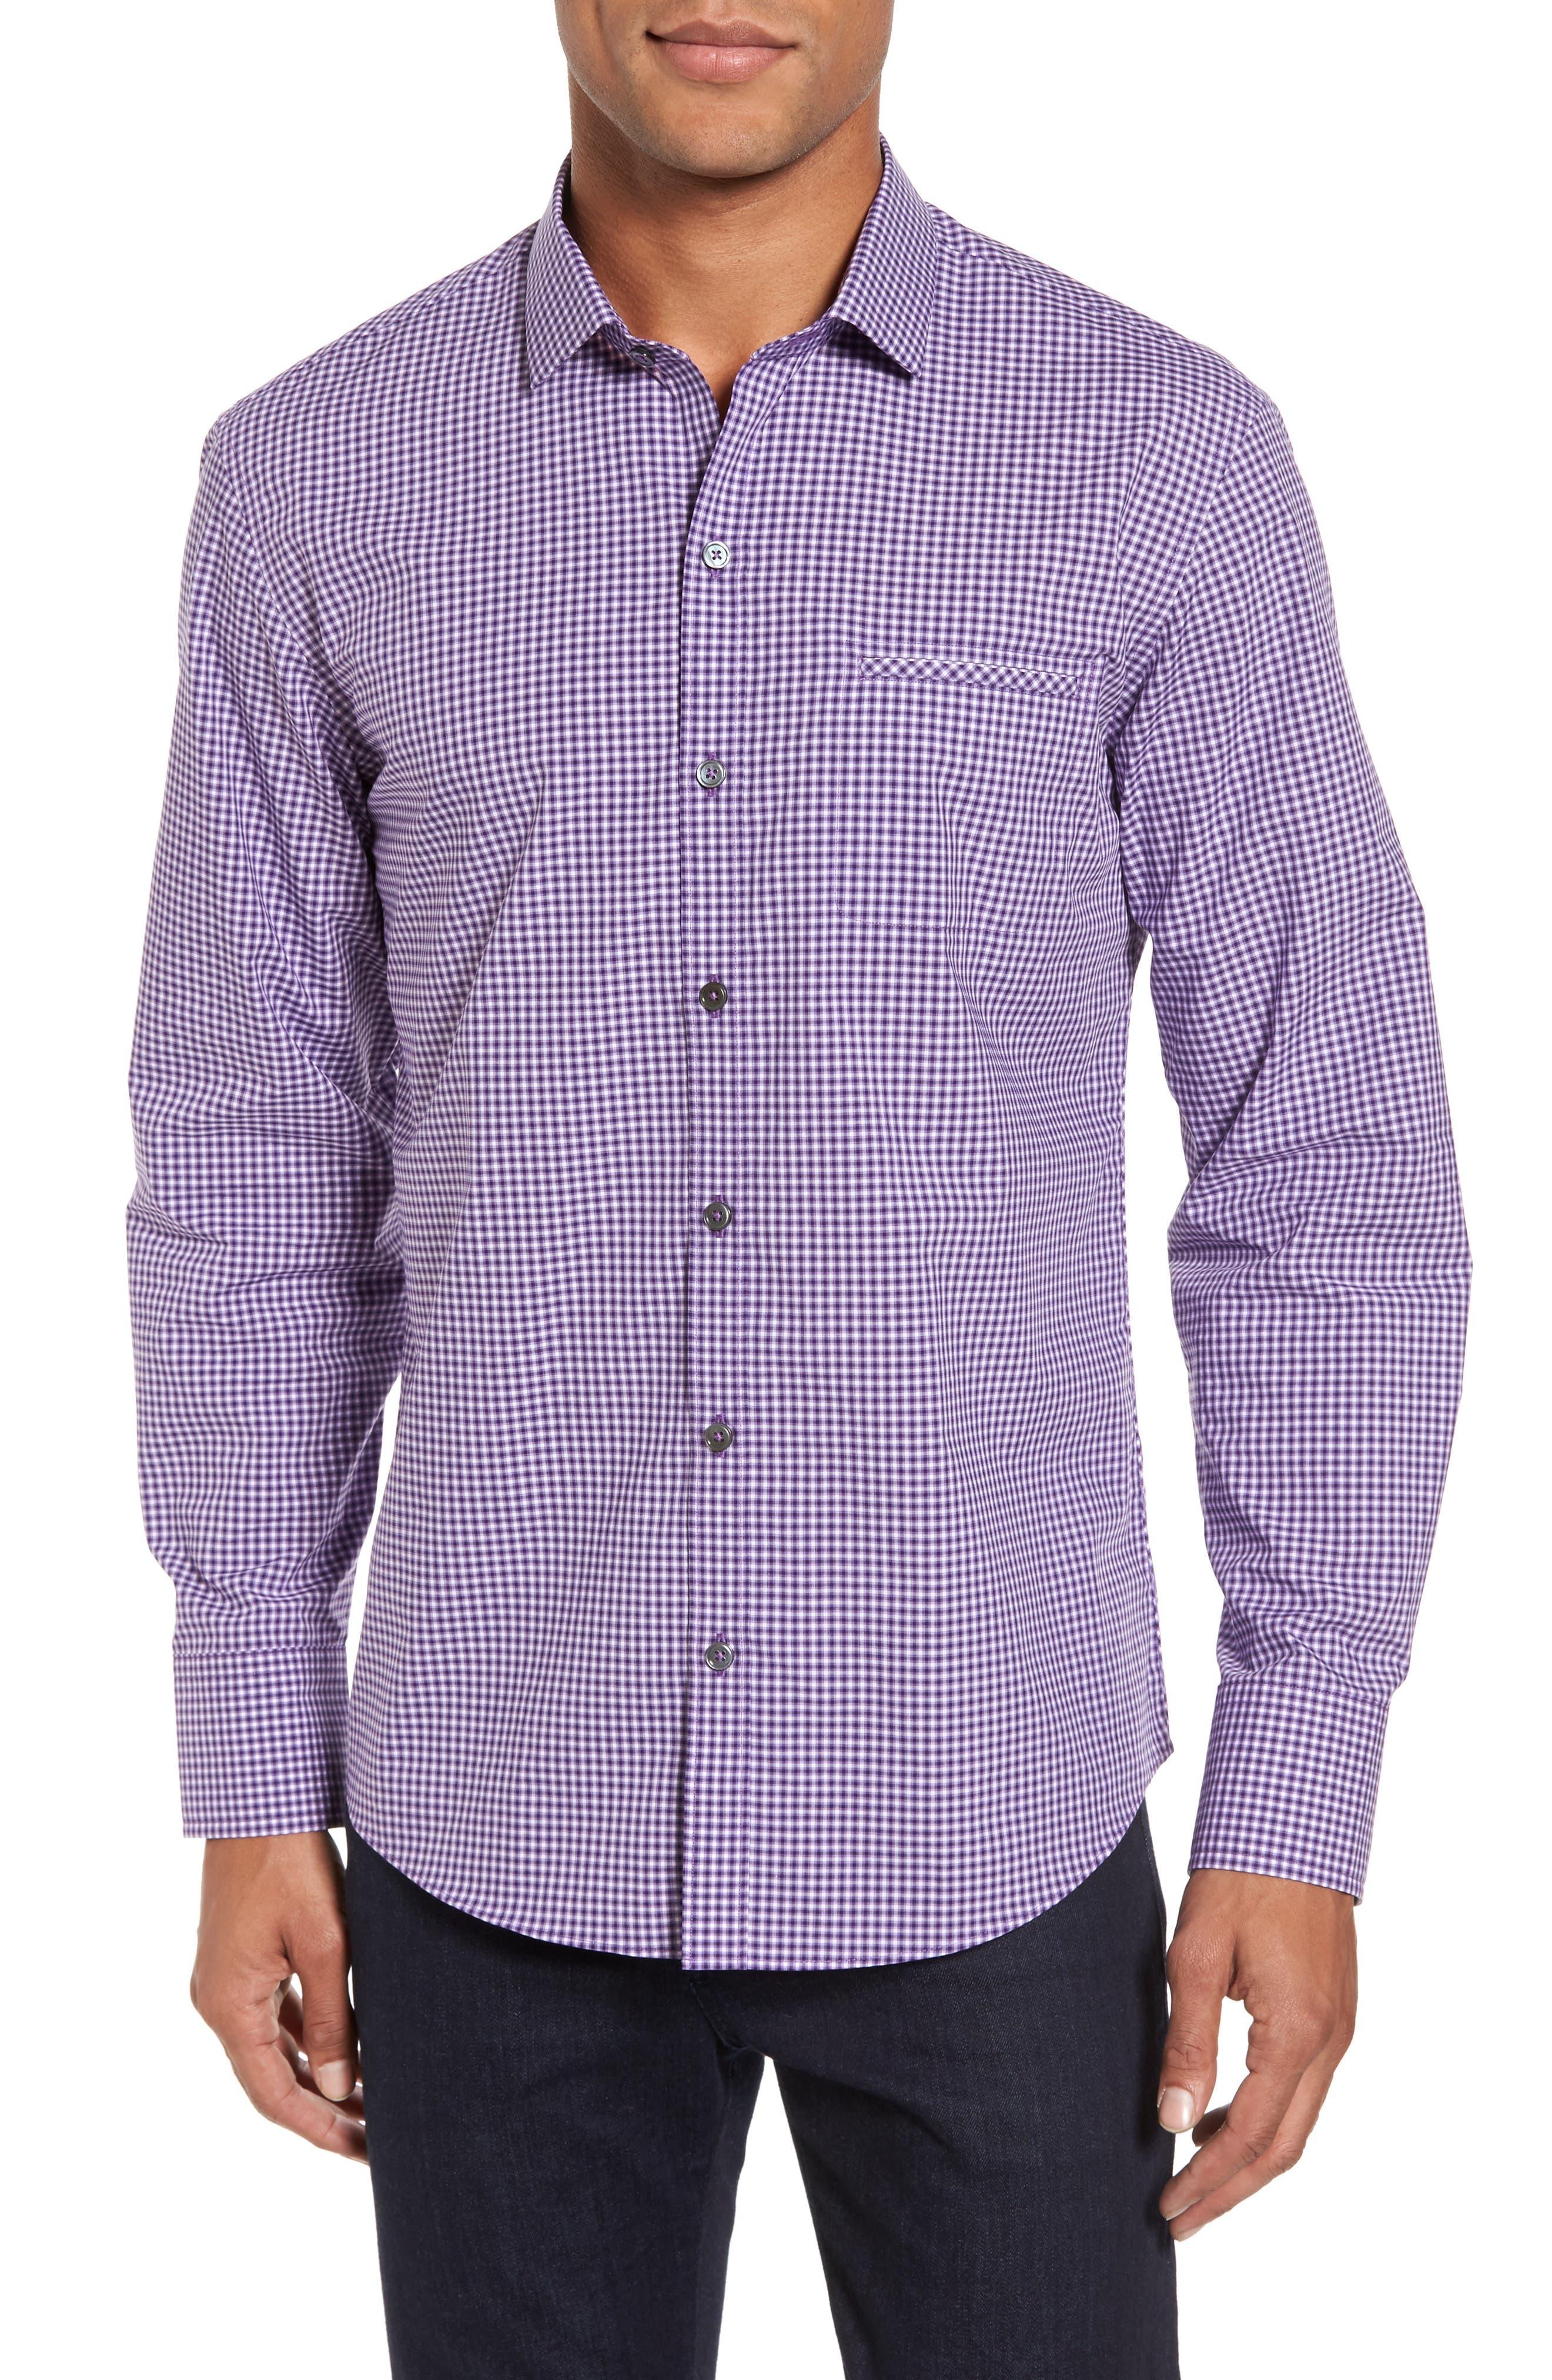 Pawlata Slim Fit Check Sport Shirt,                             Main thumbnail 1, color,                             500